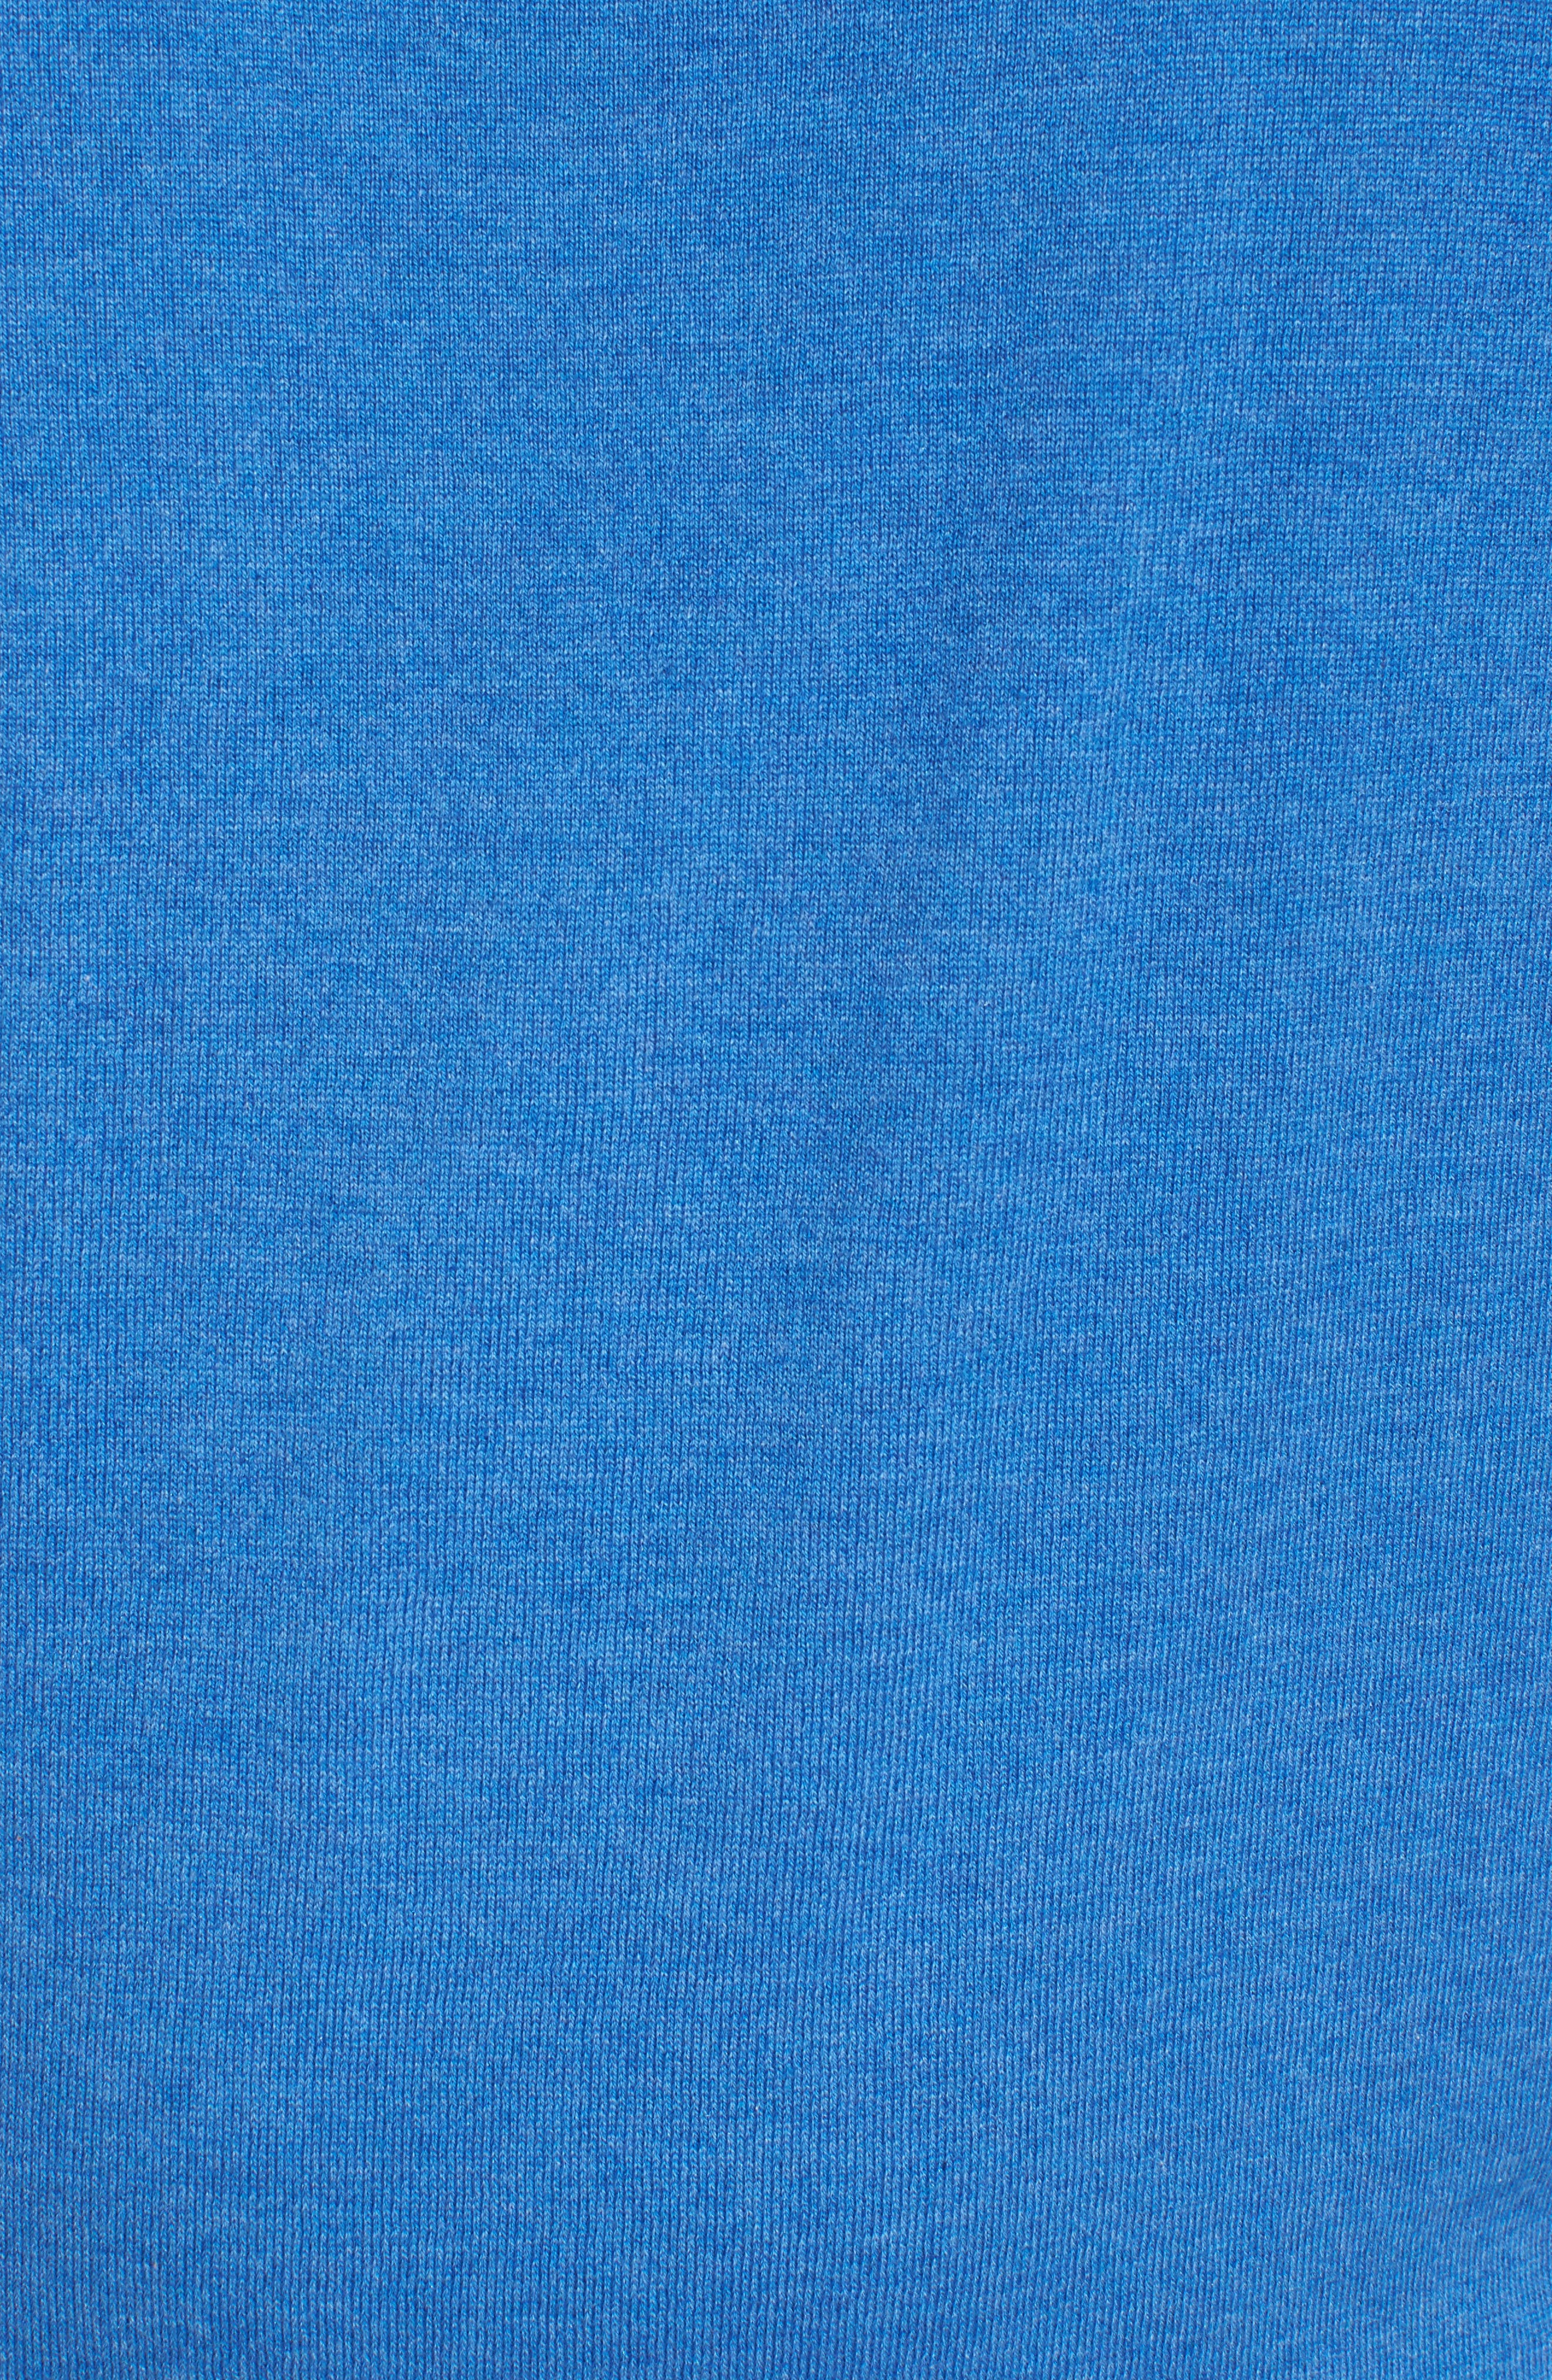 Crown Soft Quarter-Zip Pullover,                             Alternate thumbnail 5, color,                             Boardwalk Blue